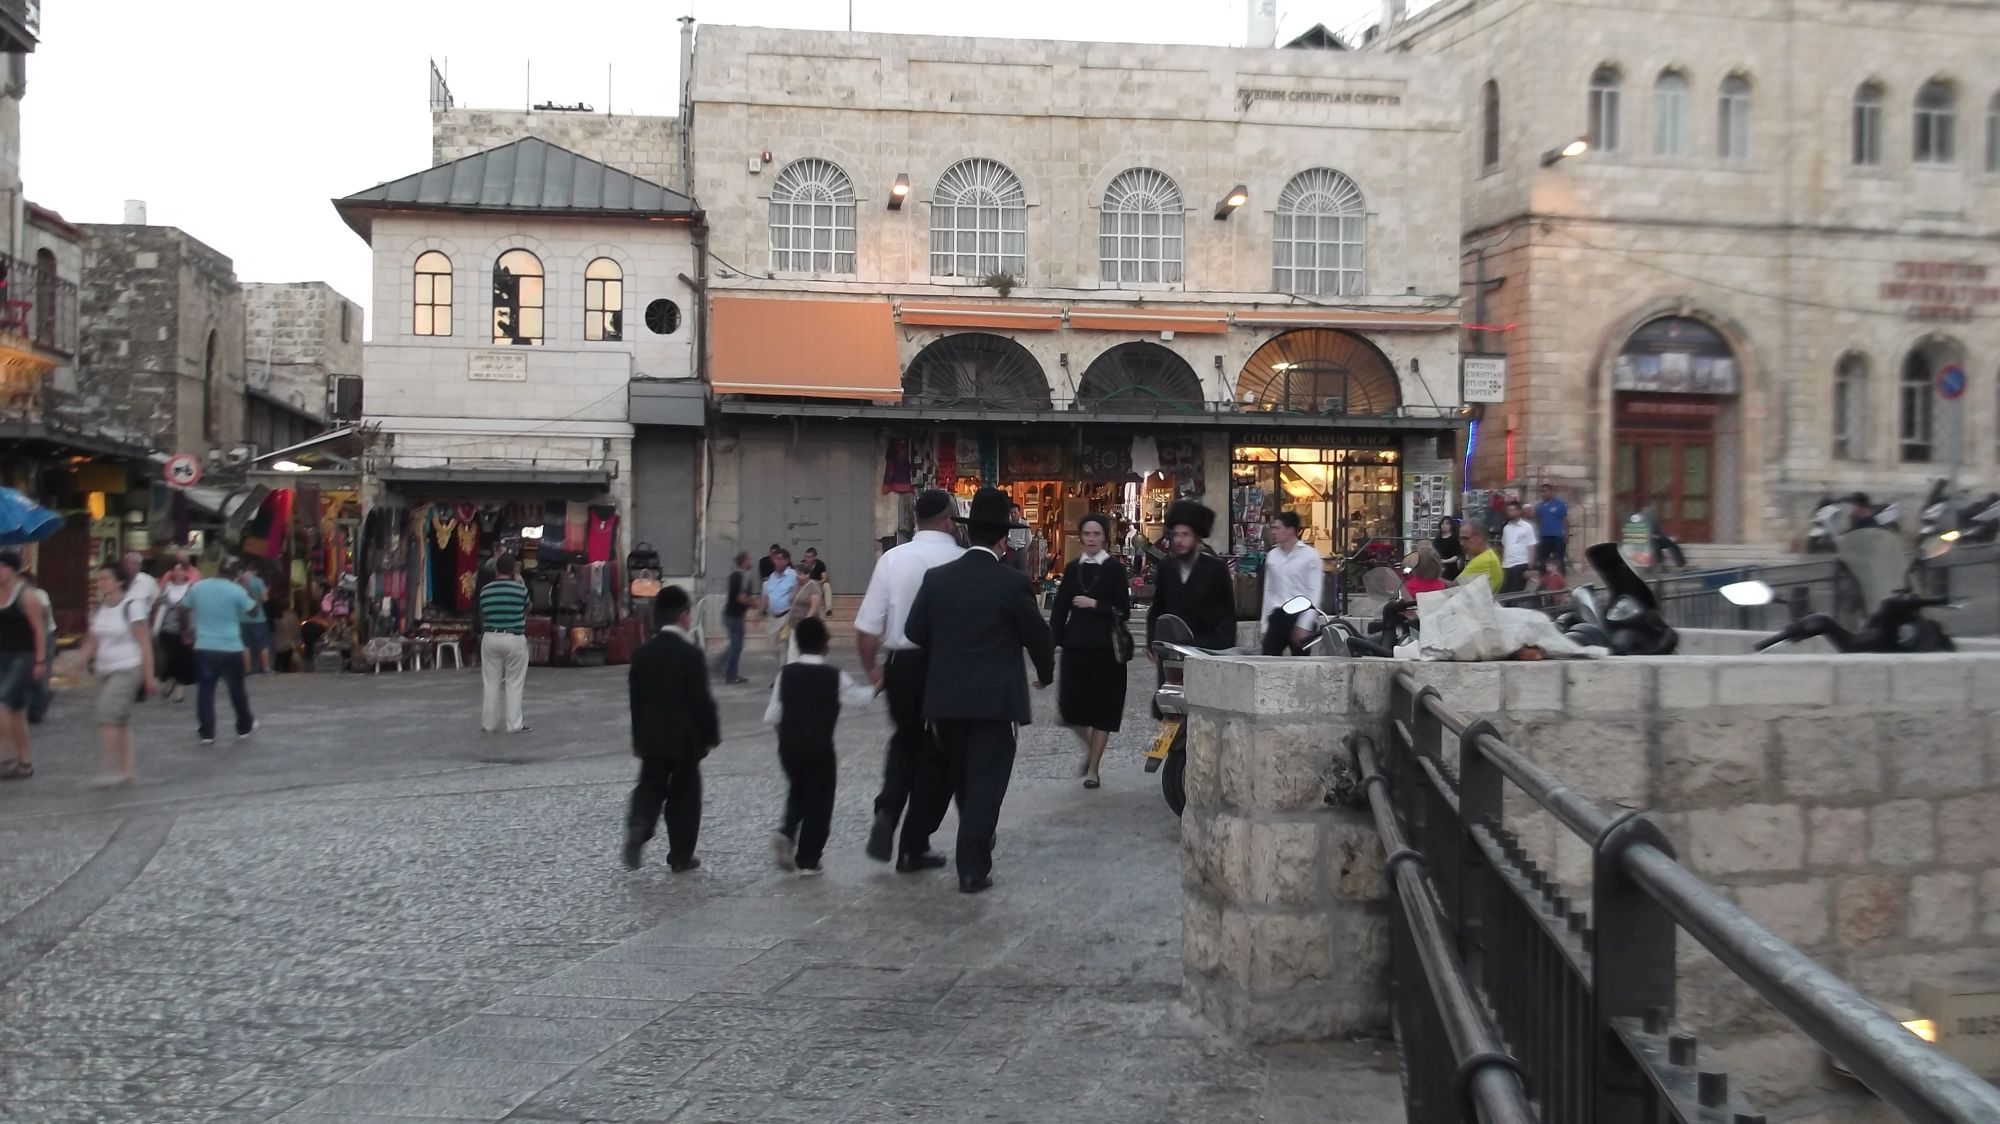 Izrael - Jerozolima Stare Miasto - zdjęcia, atrakcje